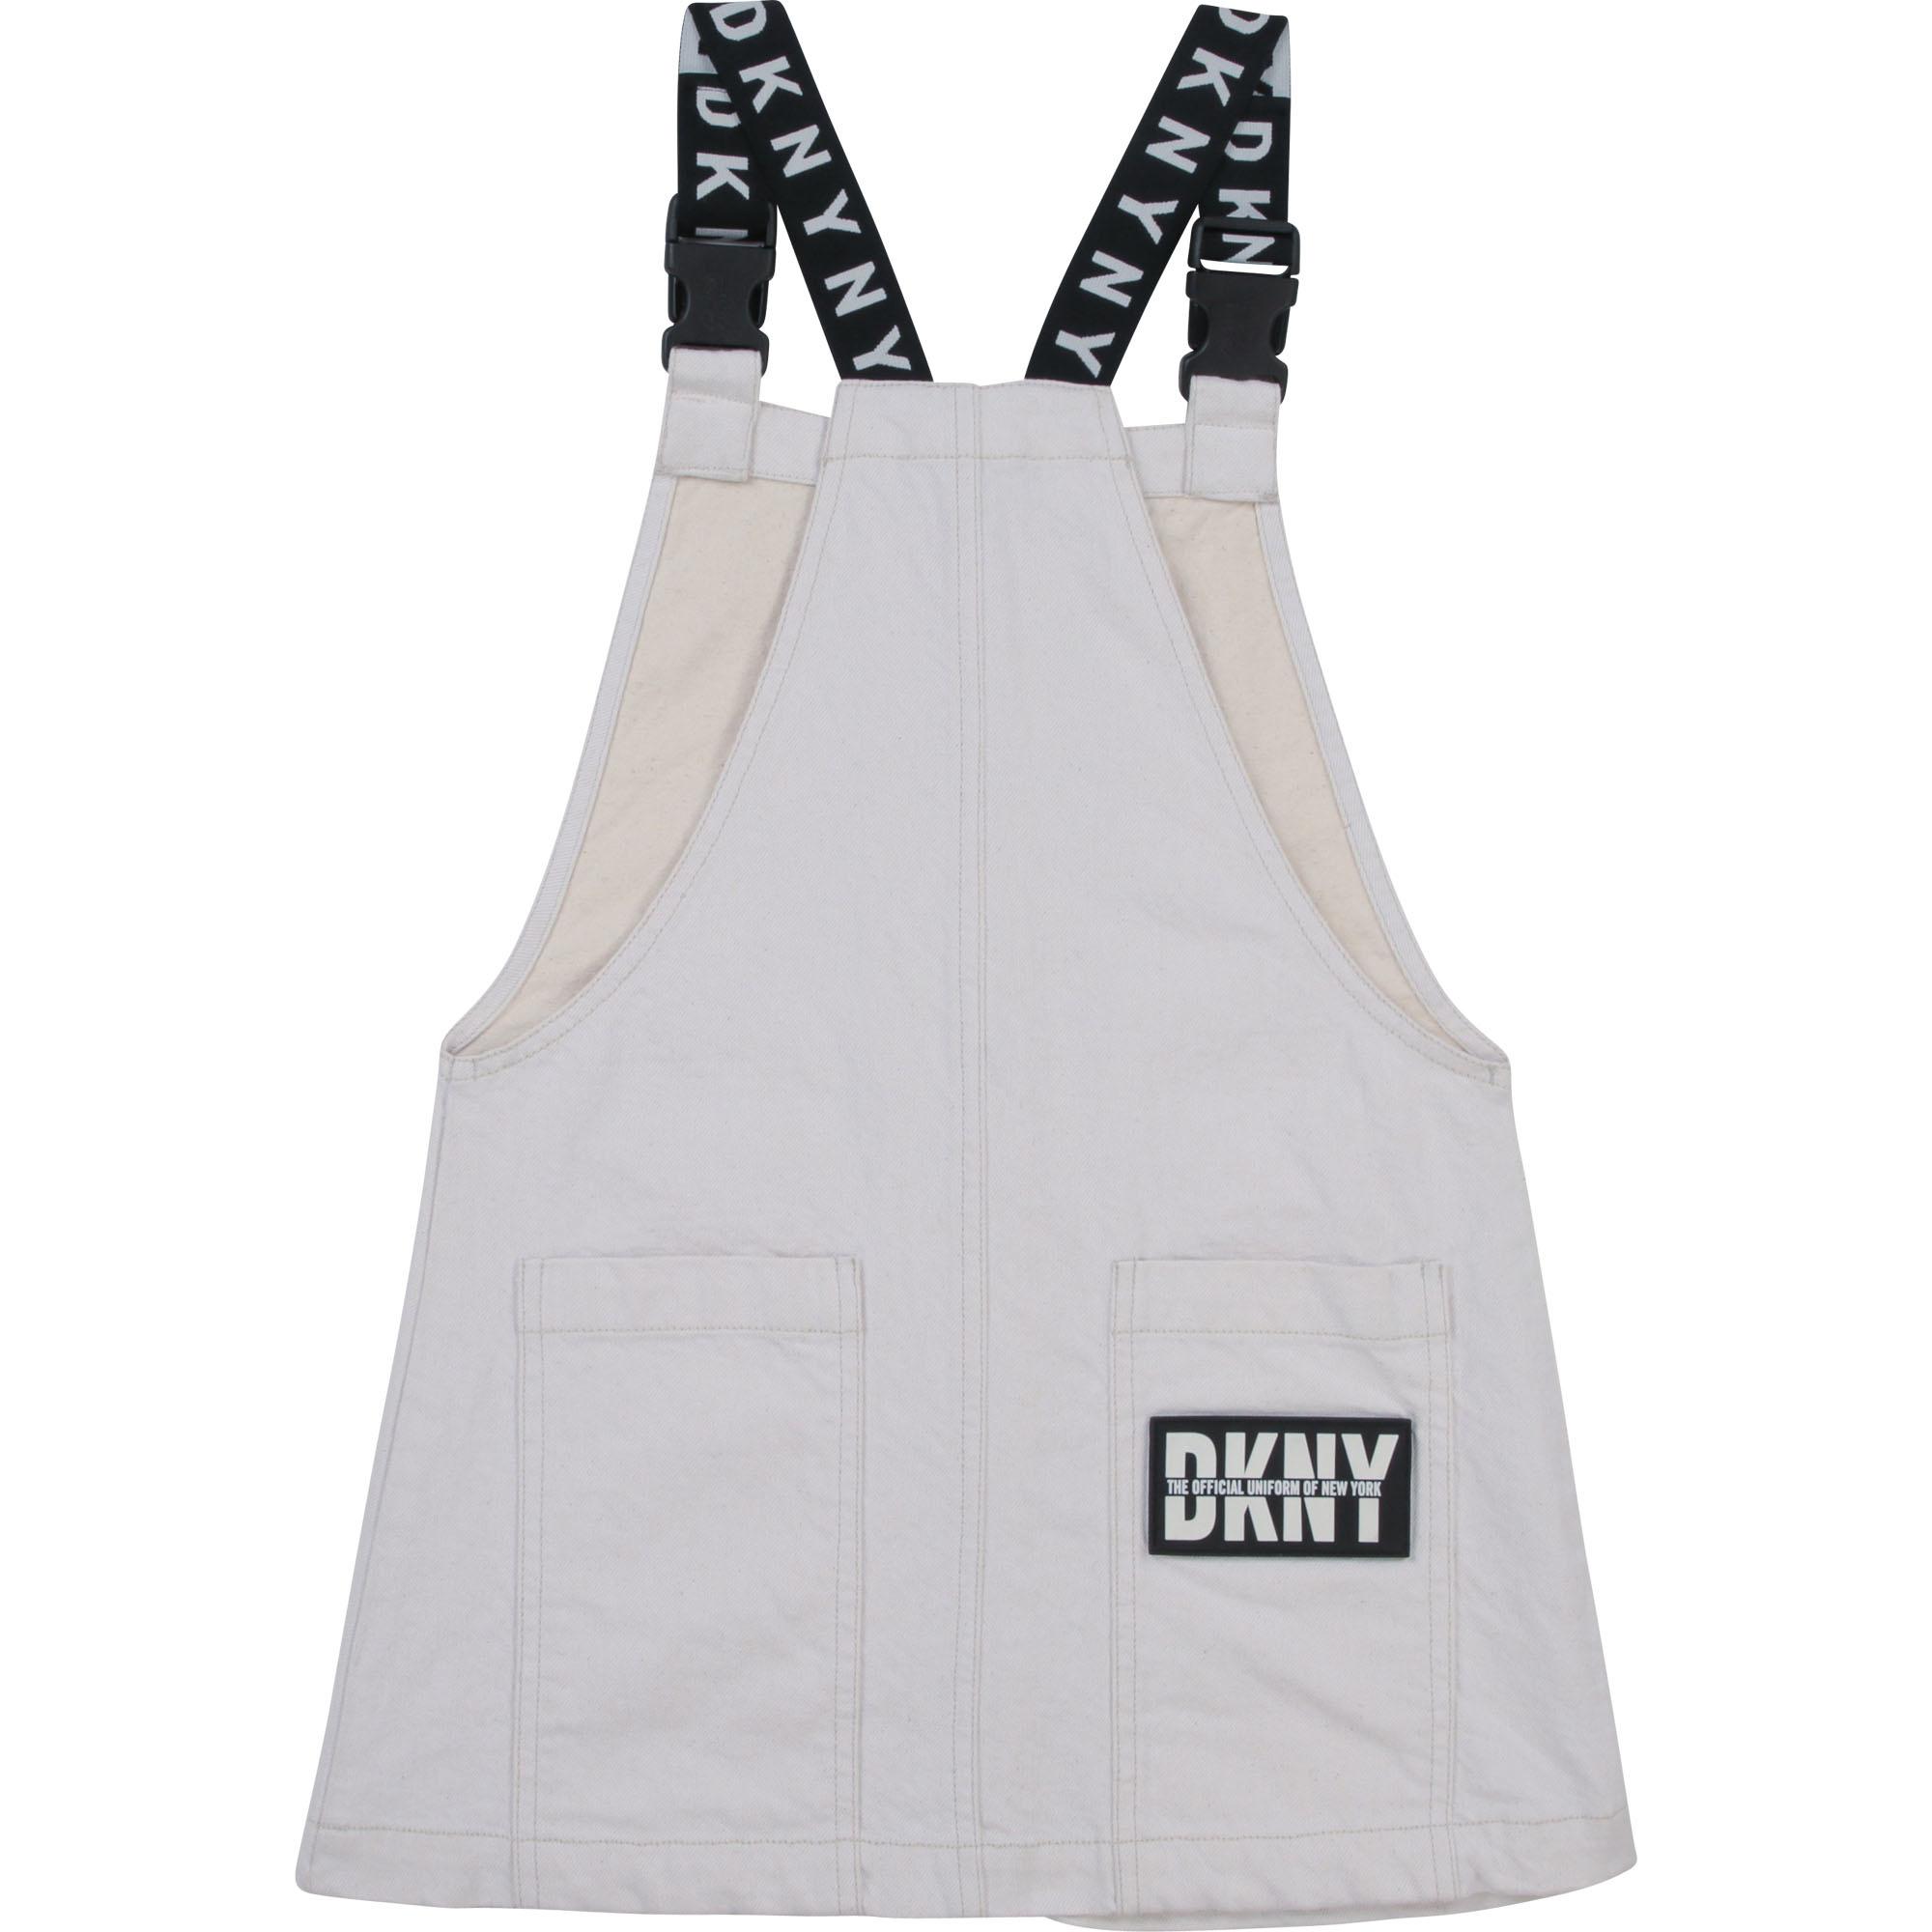 DKNY robe salopette drill-2